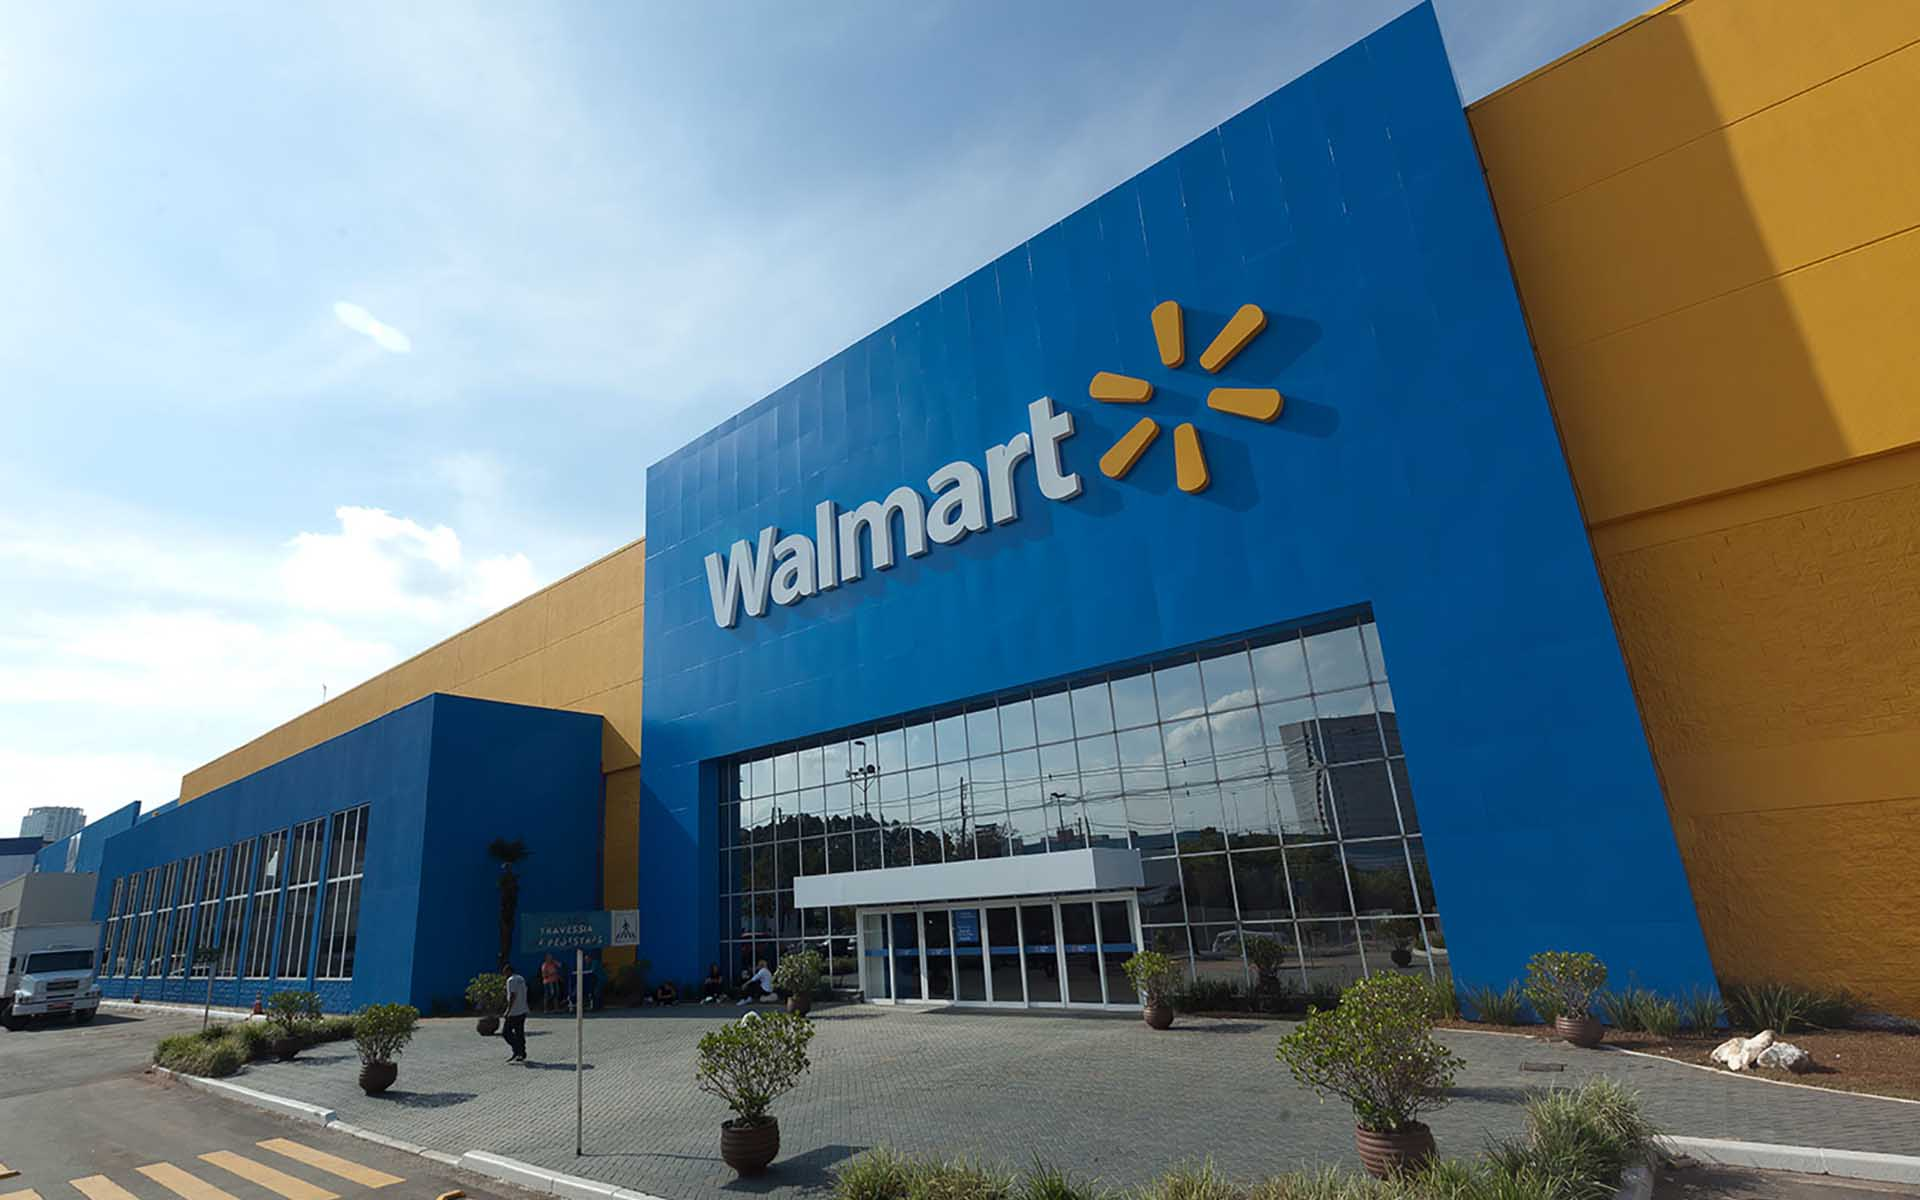 Walmart Awarded Patent for Blockchain Based Energy Management